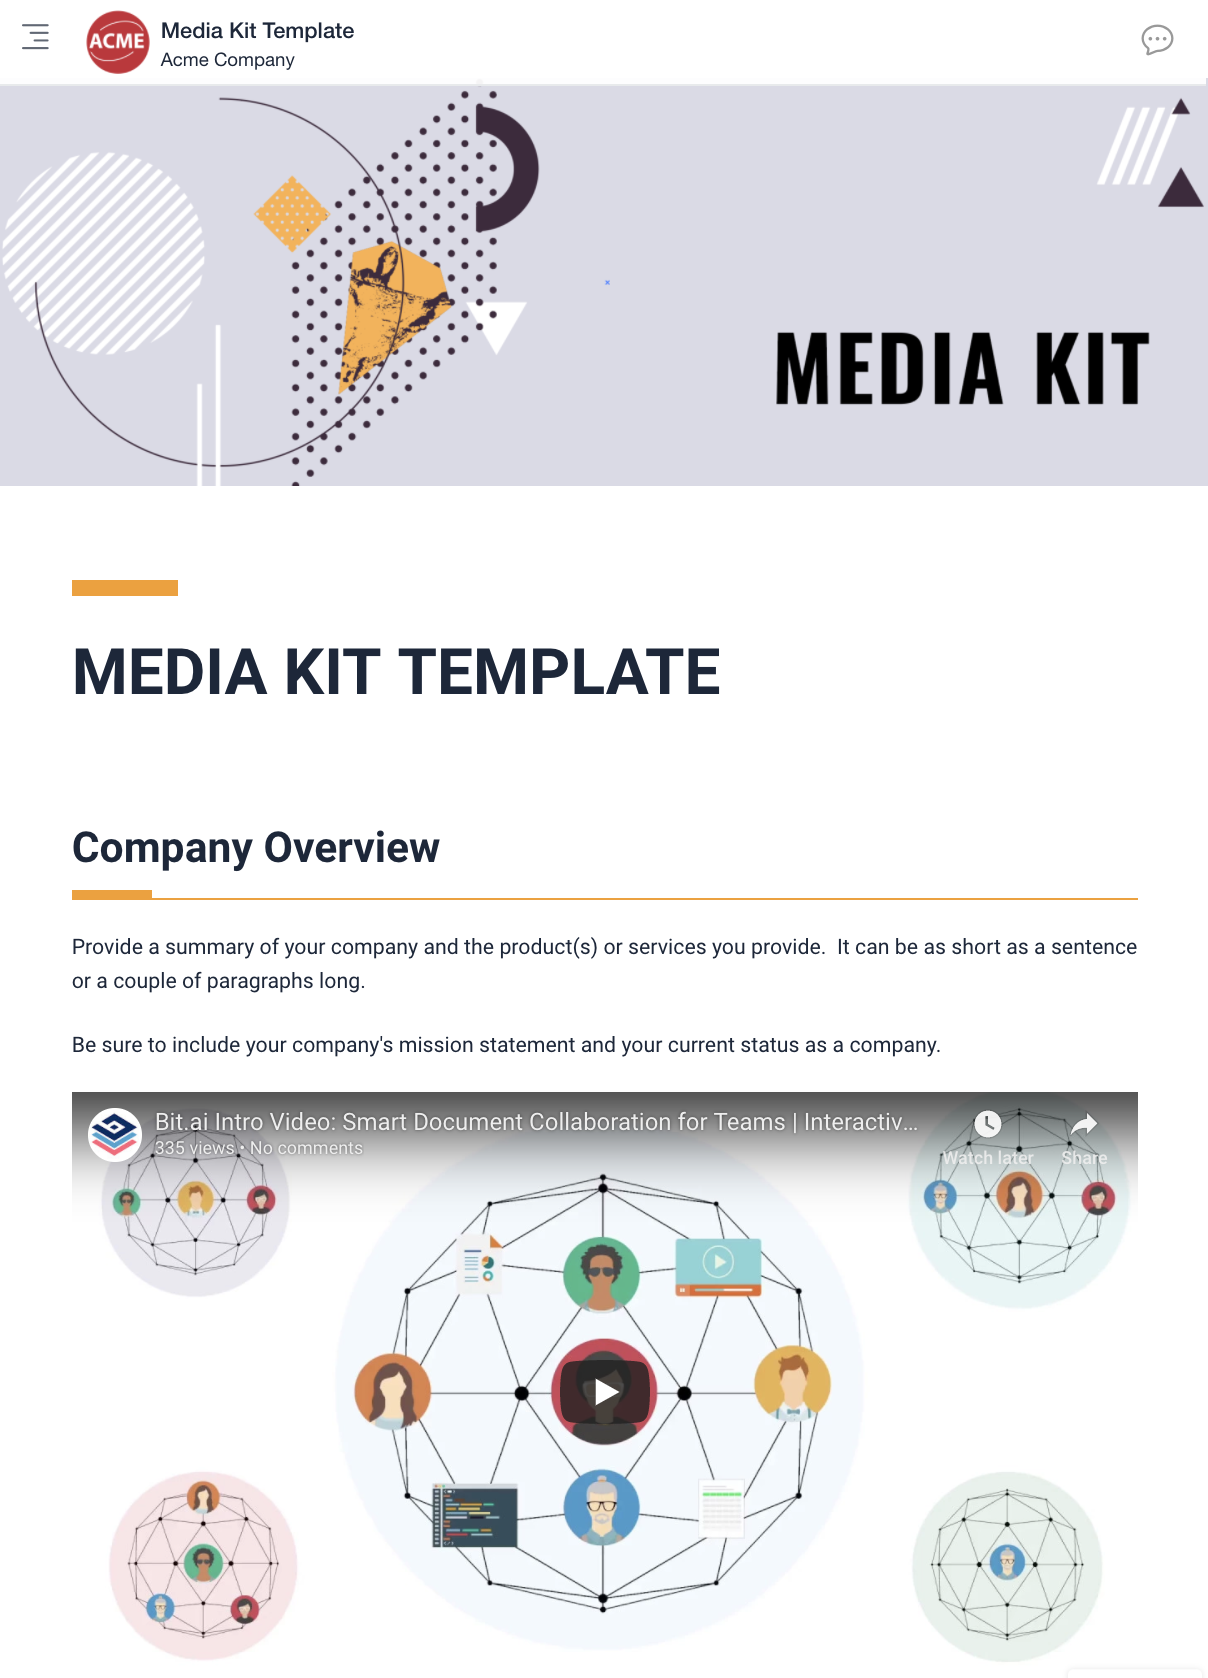 Media kit template - Bit.ai